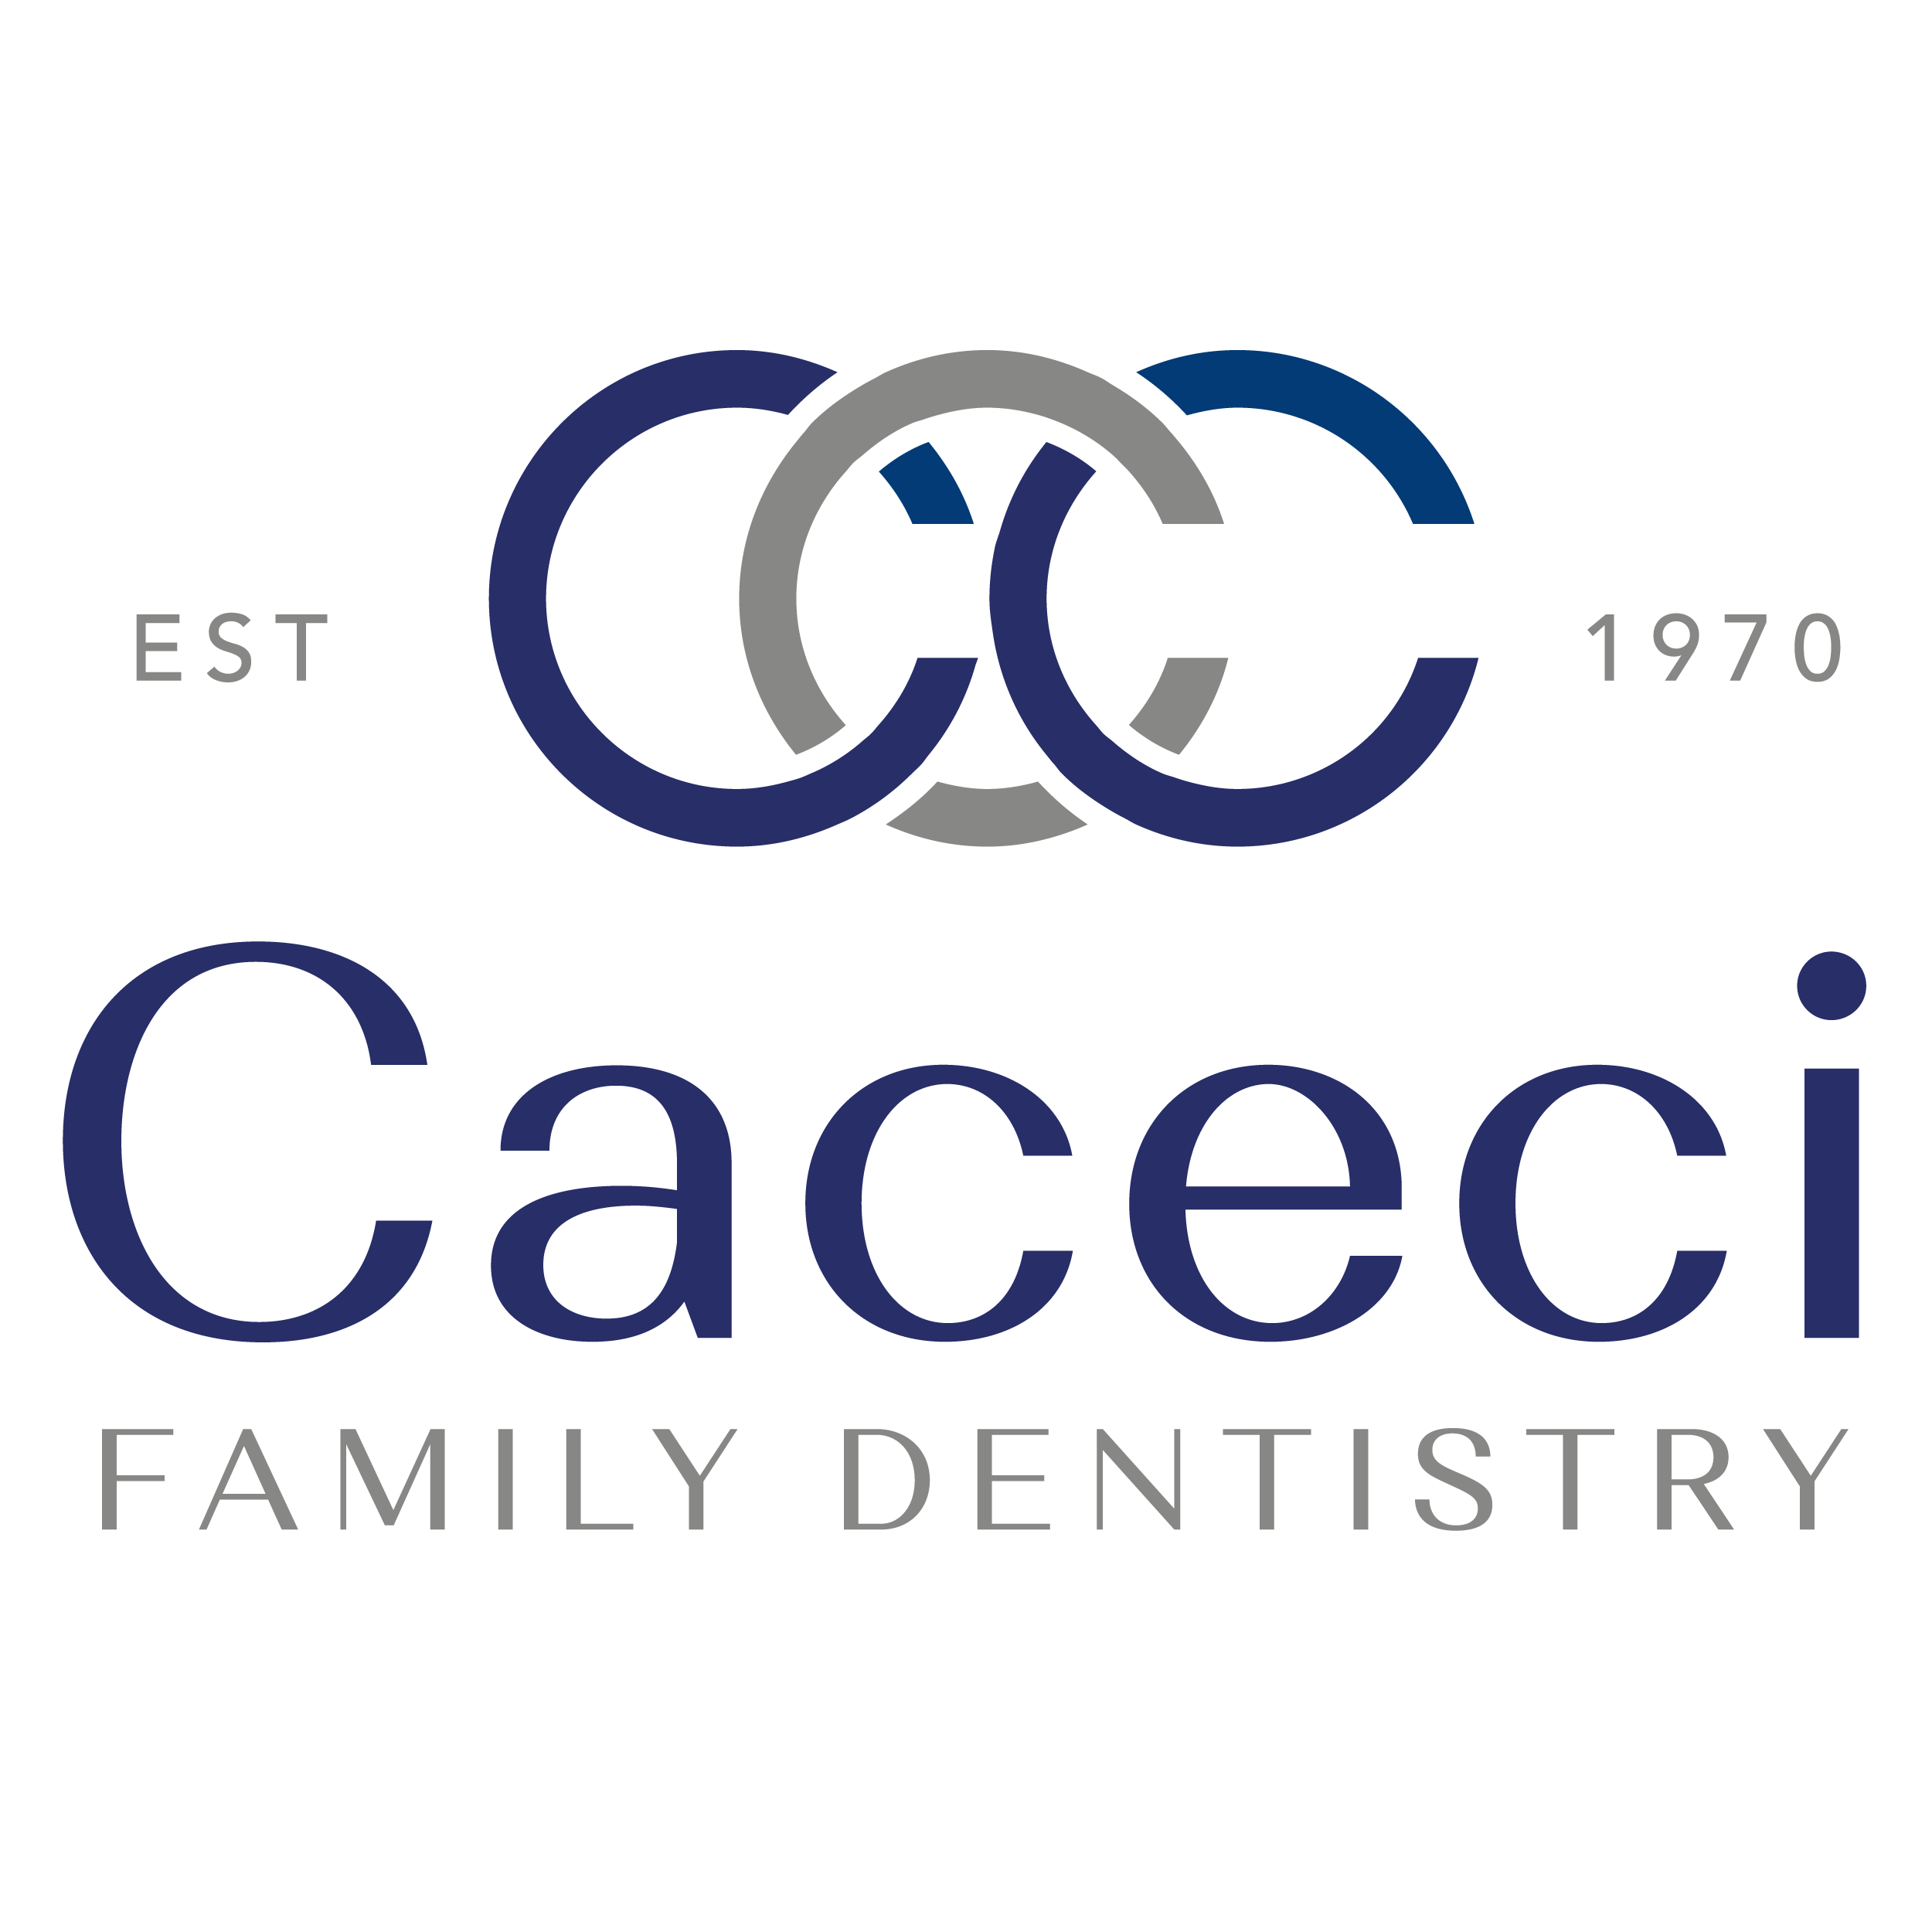 Caceci, Family Dentistry, New Milford,Dentist,Family Dentist,General Dentist